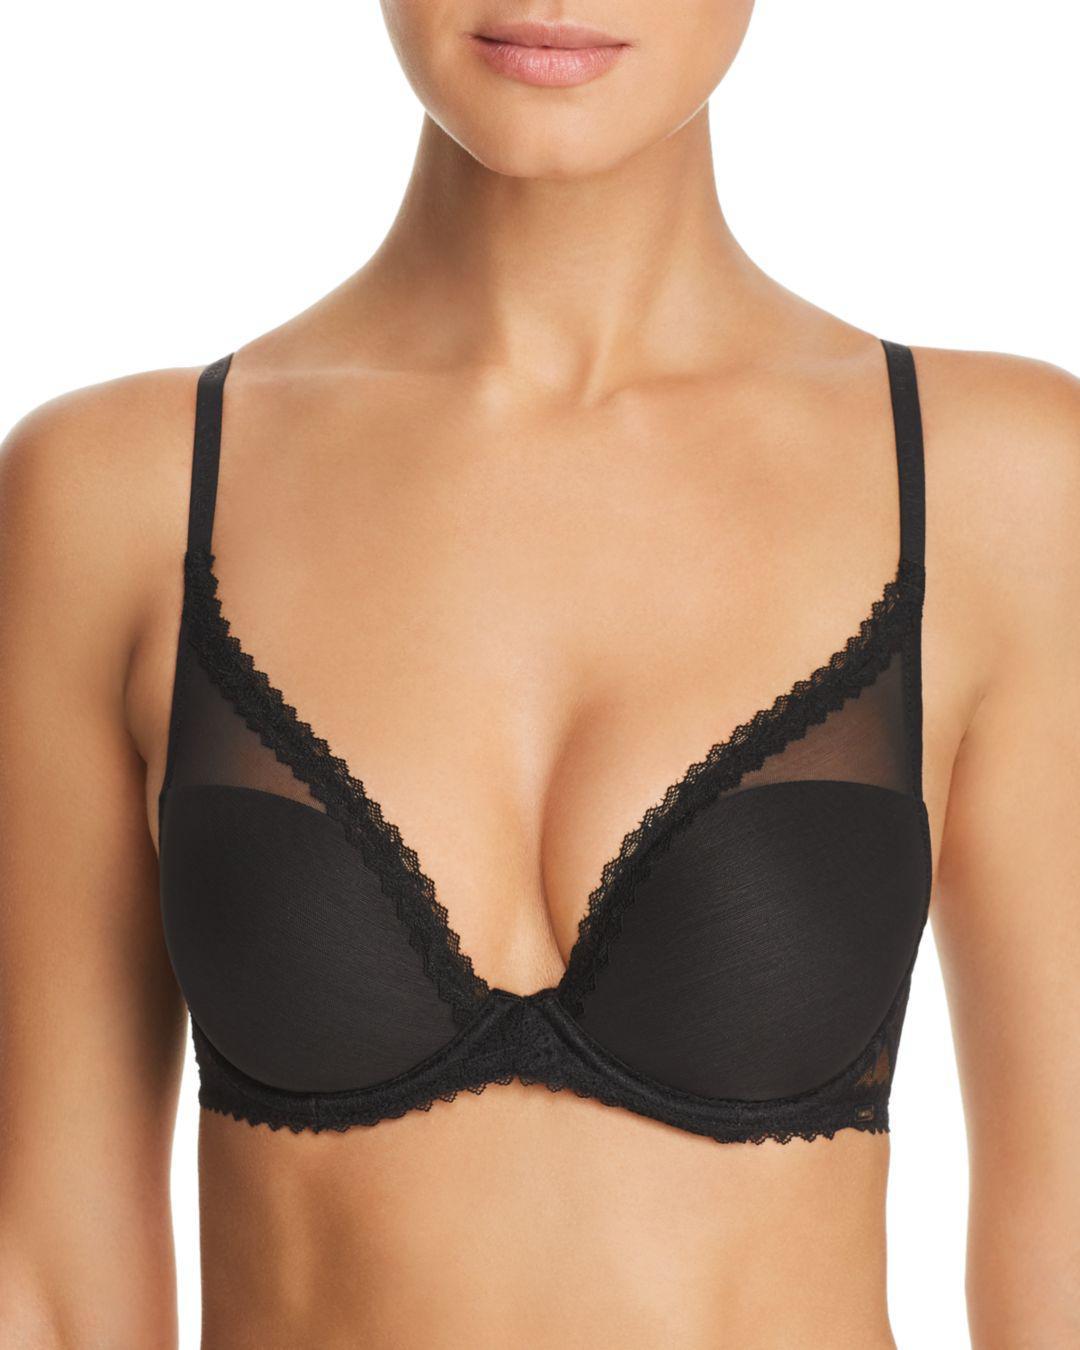 3dc2a279749 Calvin Klein. Women s Black Perfectly Fit Perennial Deep Plunge ...